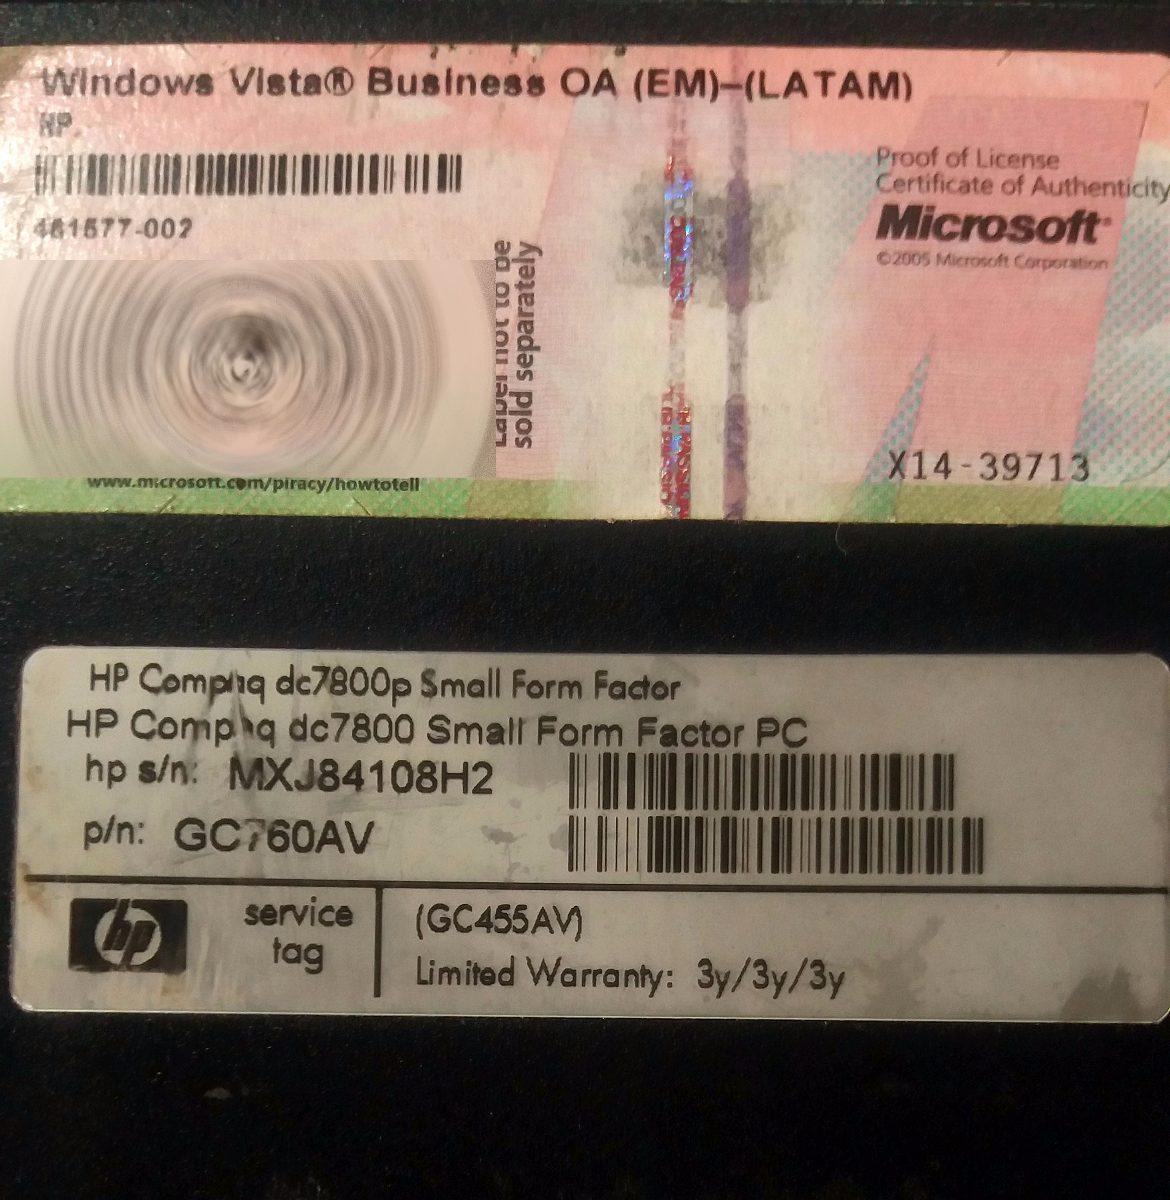 Core 2 Duo 2 83 Hp Dc7800 Hd 750 Gb Ram 2 Gb Win 10 Office - $ 1,850 00